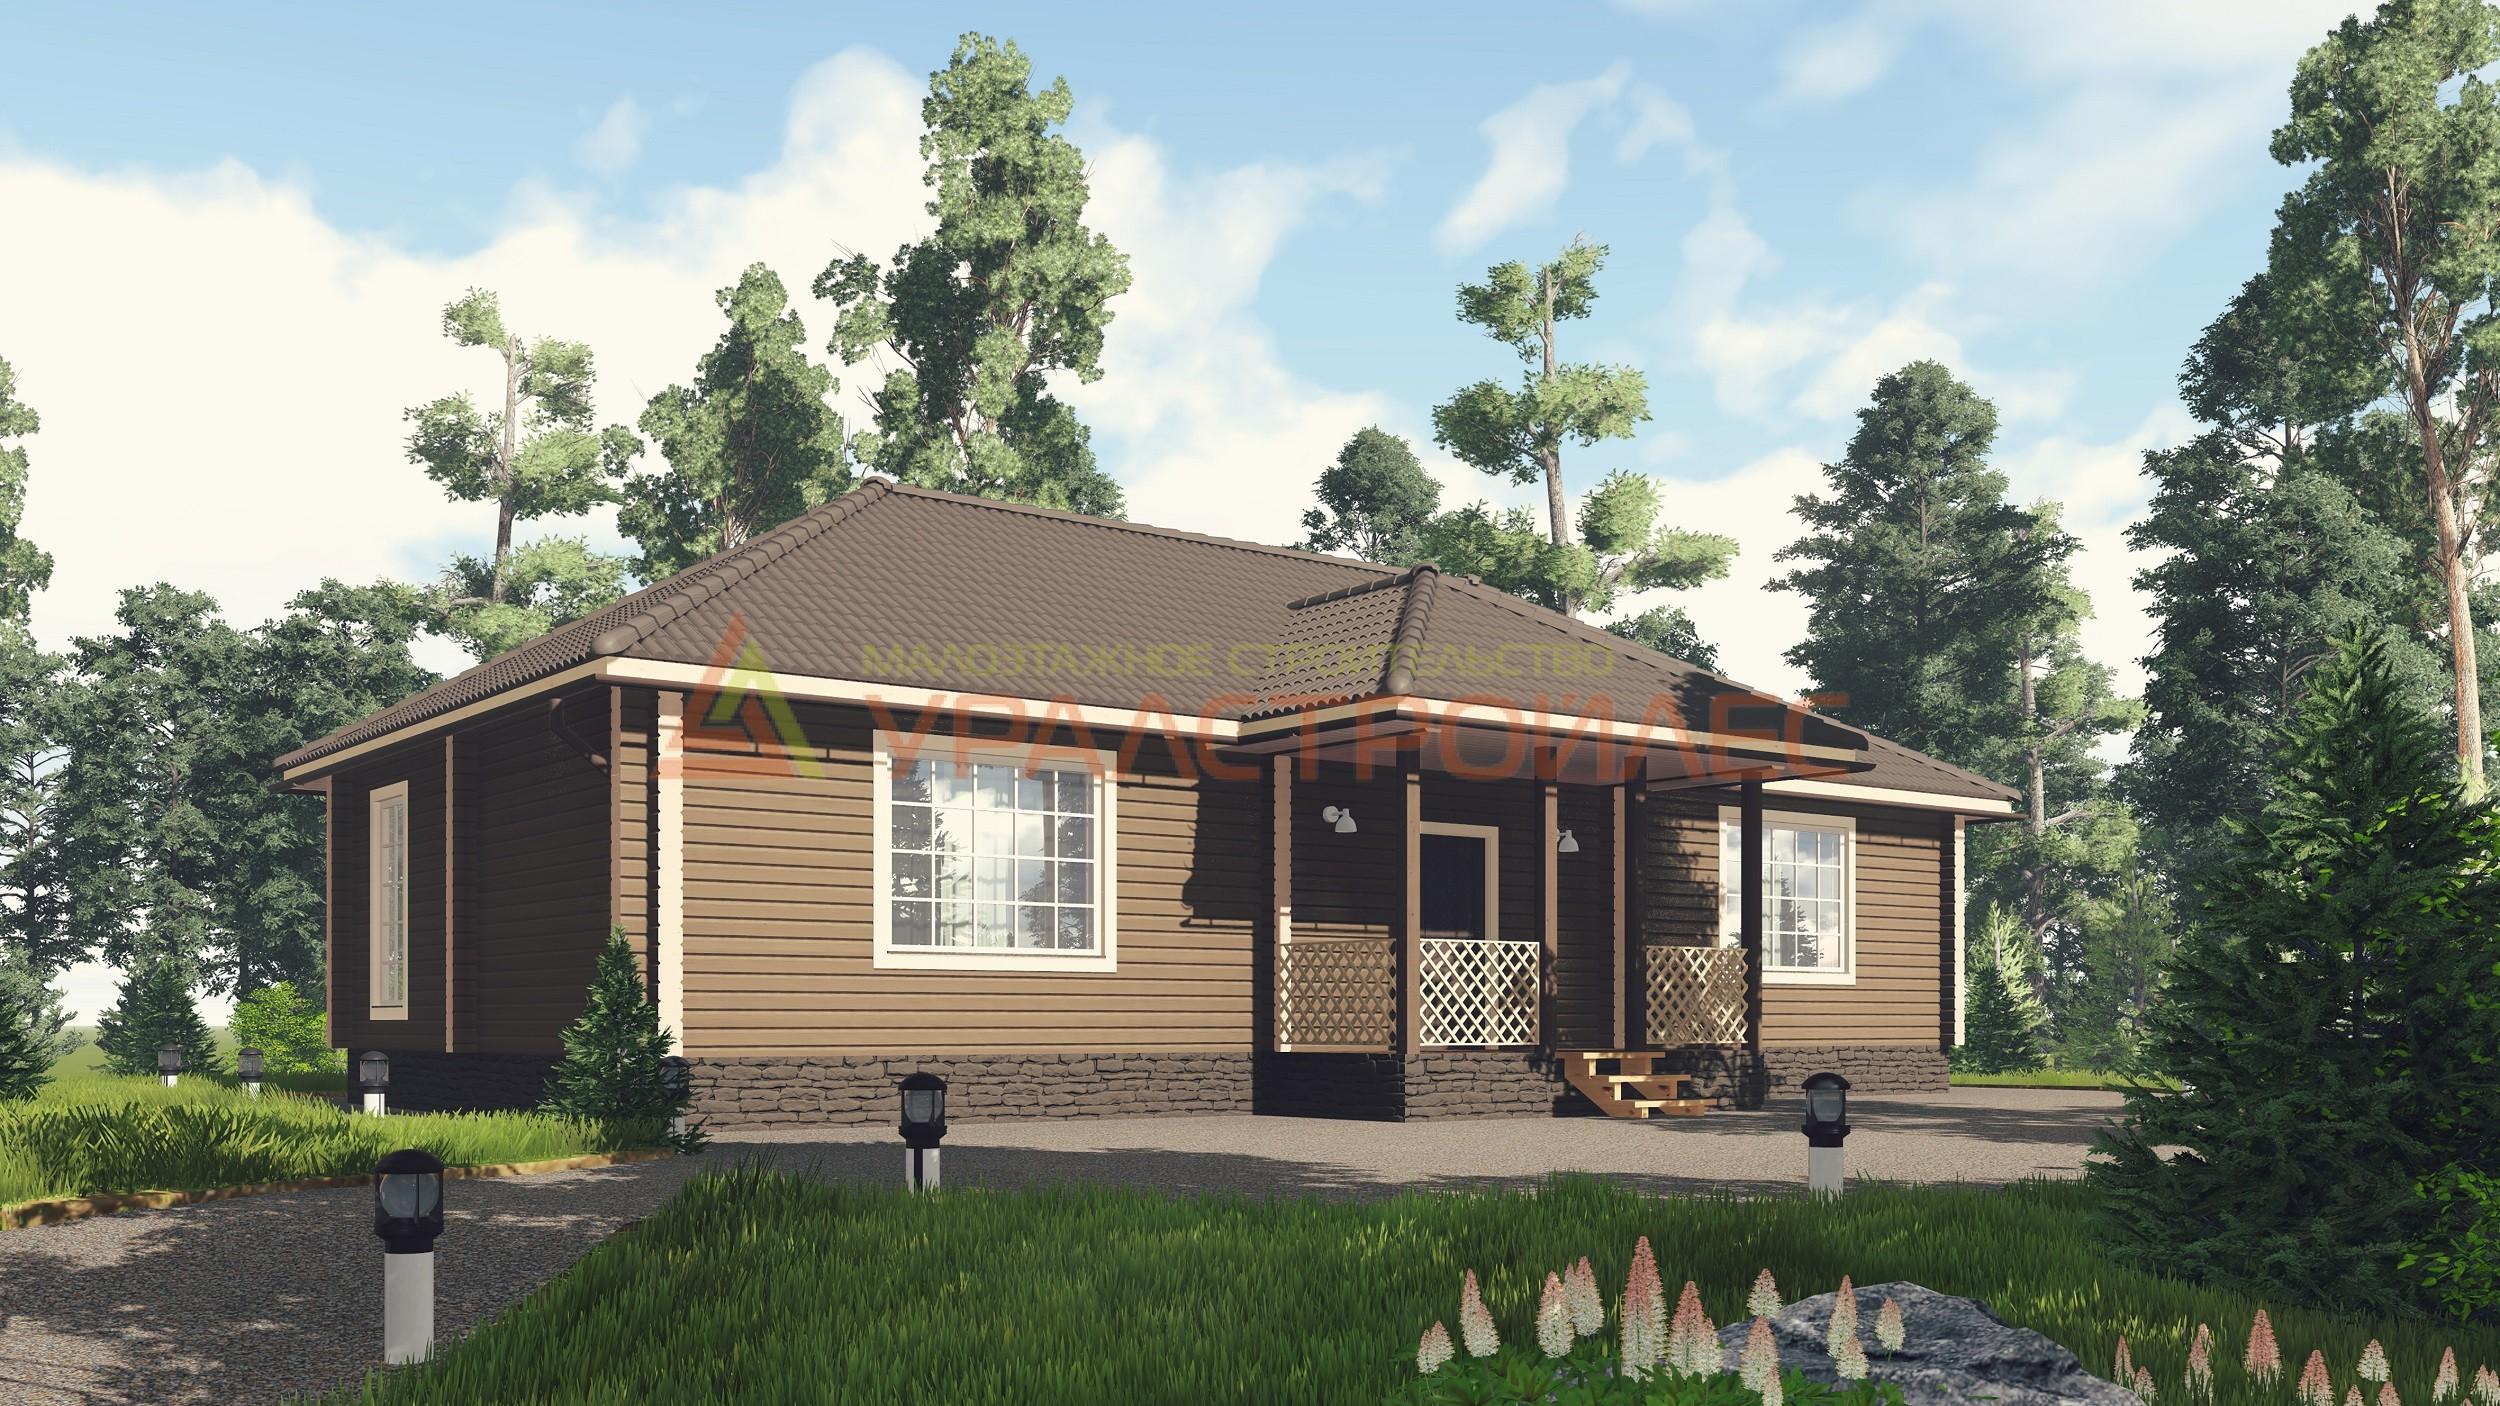 Проект № 735 Дом одноэтажный  15.87х9.84 (Брус 140х190), 125.0 м. кв.